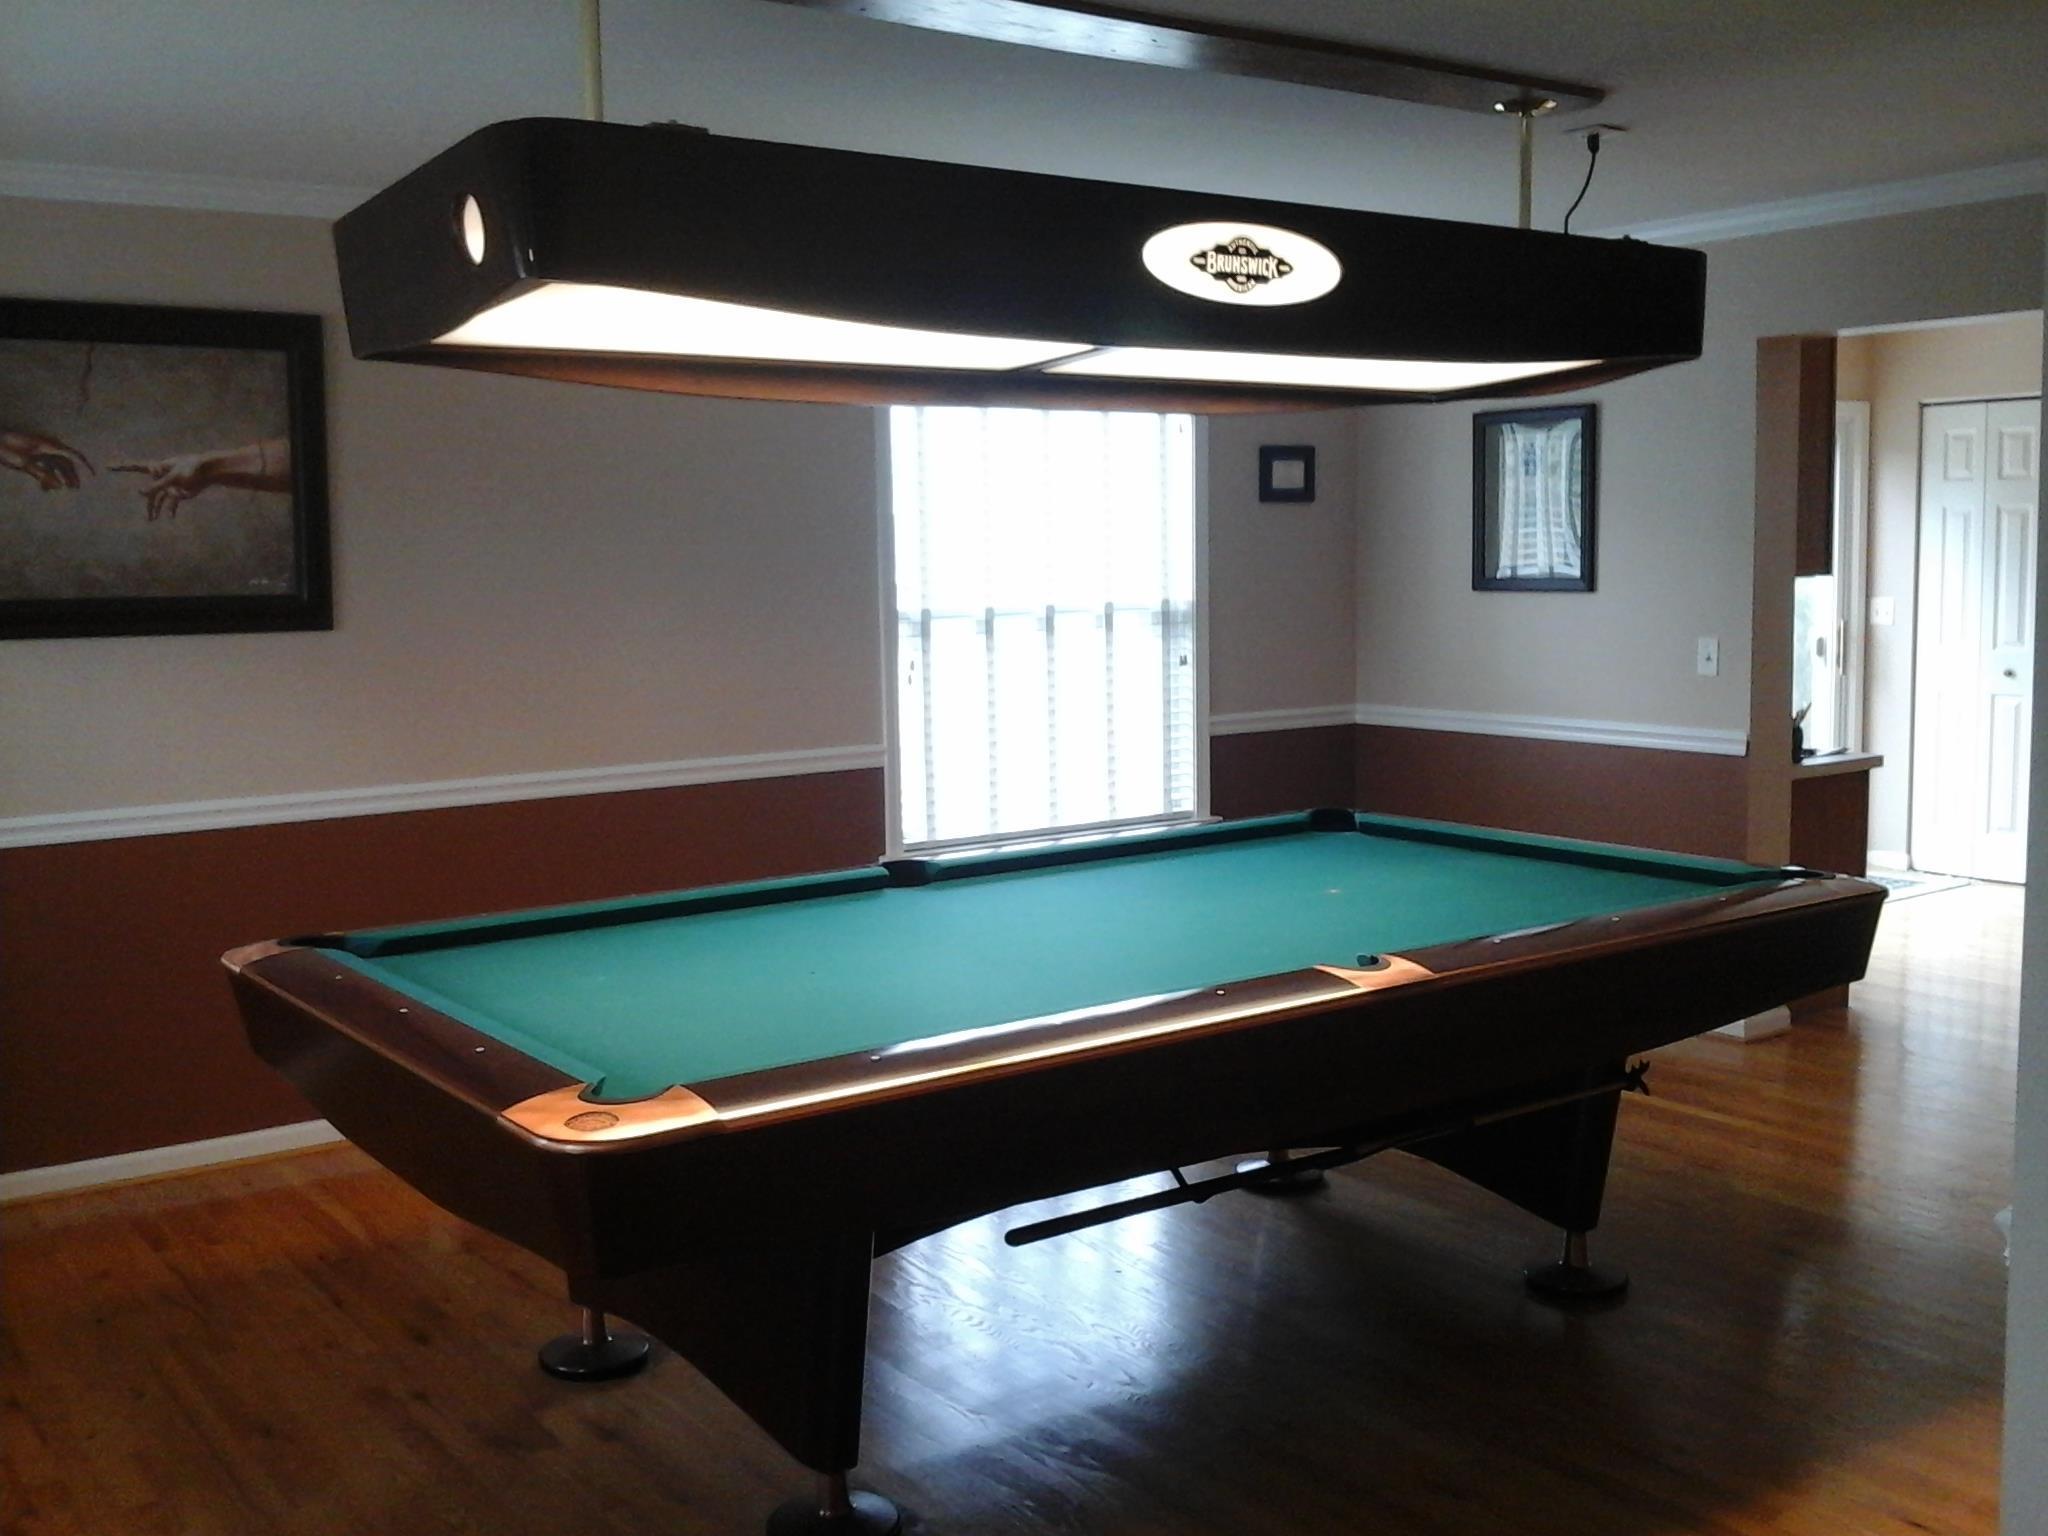 Brunswick gold crown iv billiard table light for sale - Pool table lights ...